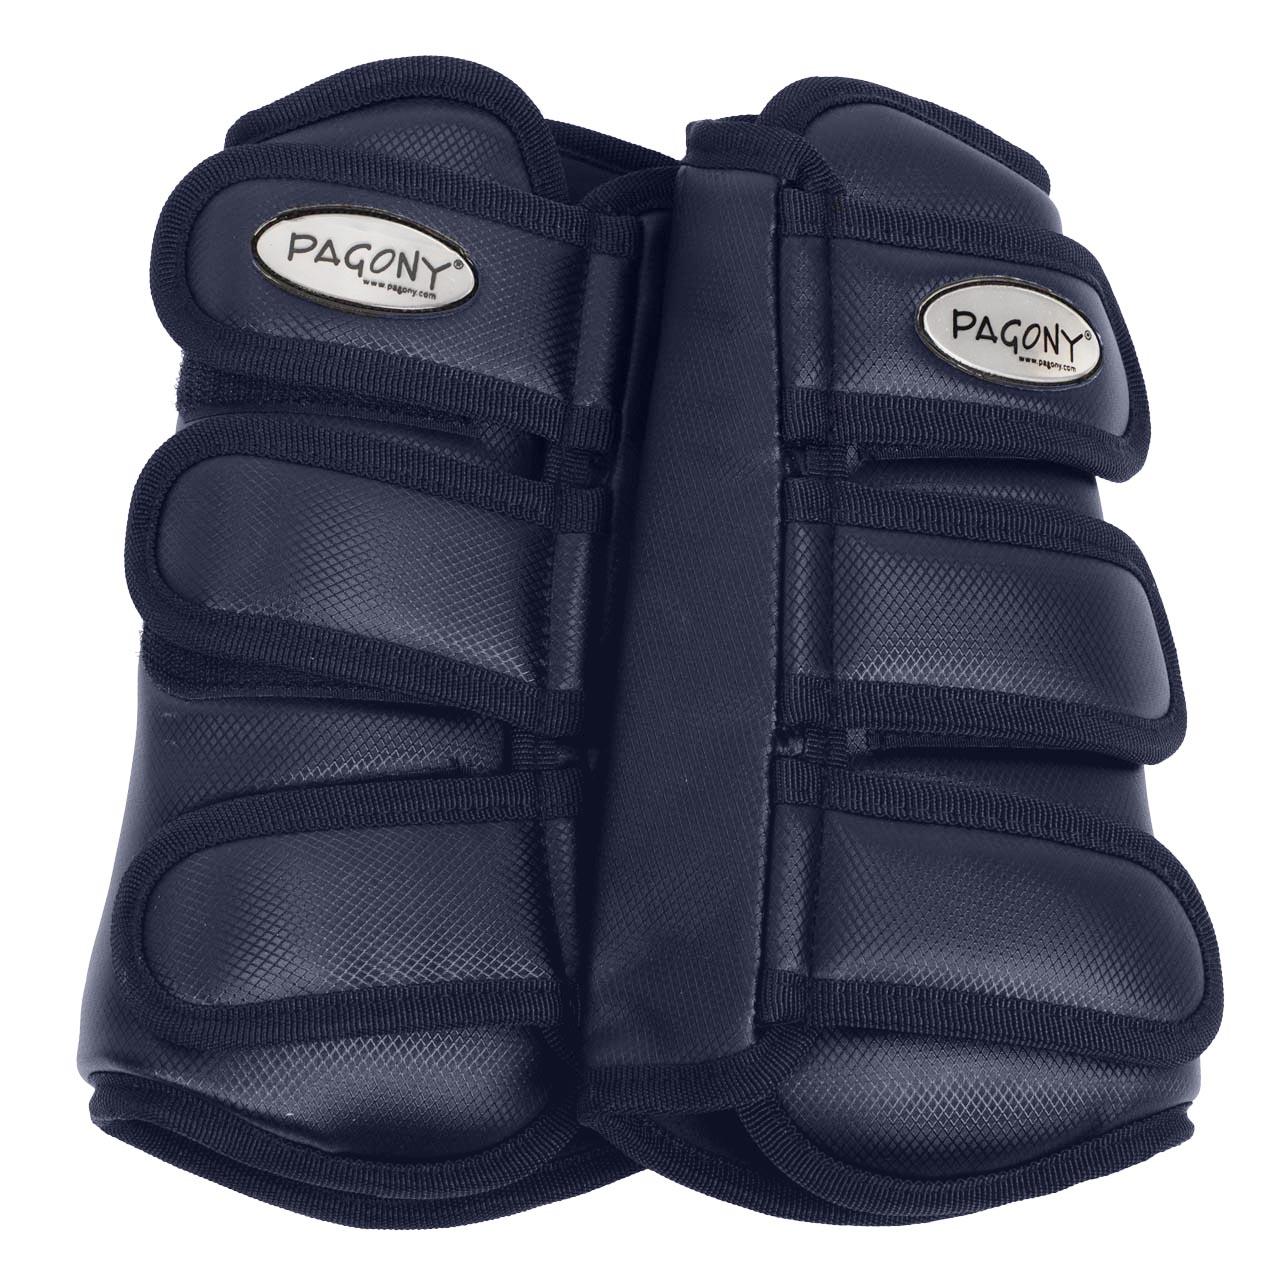 Pagony Dressage Boots voor donkerblauw maat:full